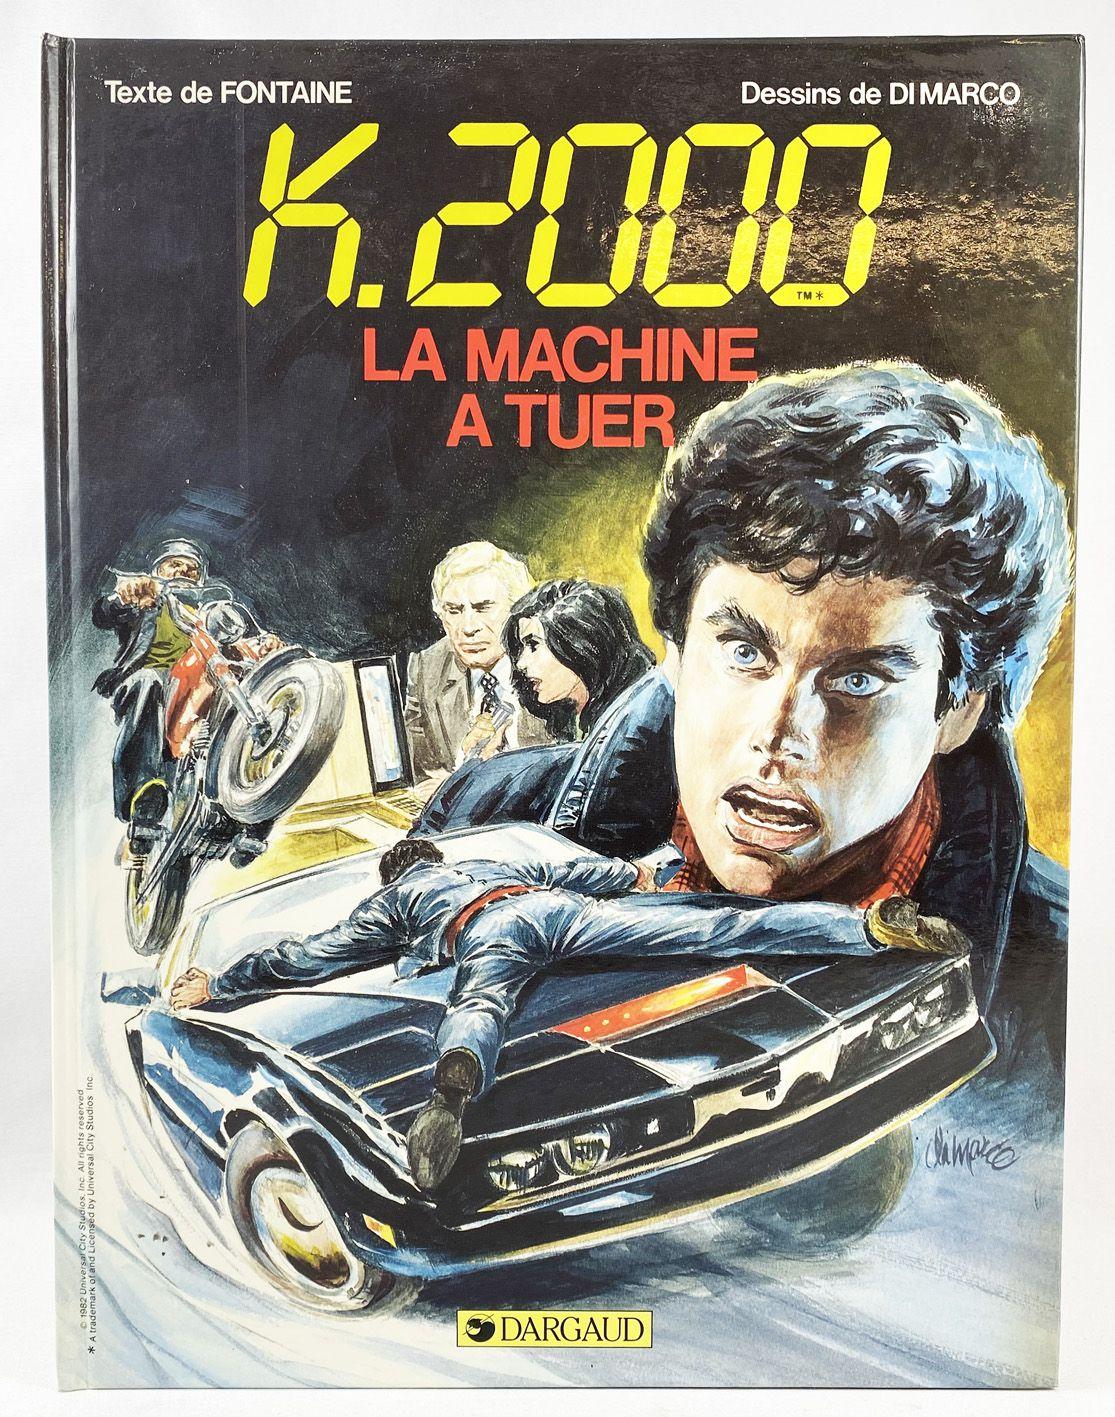 Knight Rider K2000 - La Machine à Tuer - Dargaud 1982